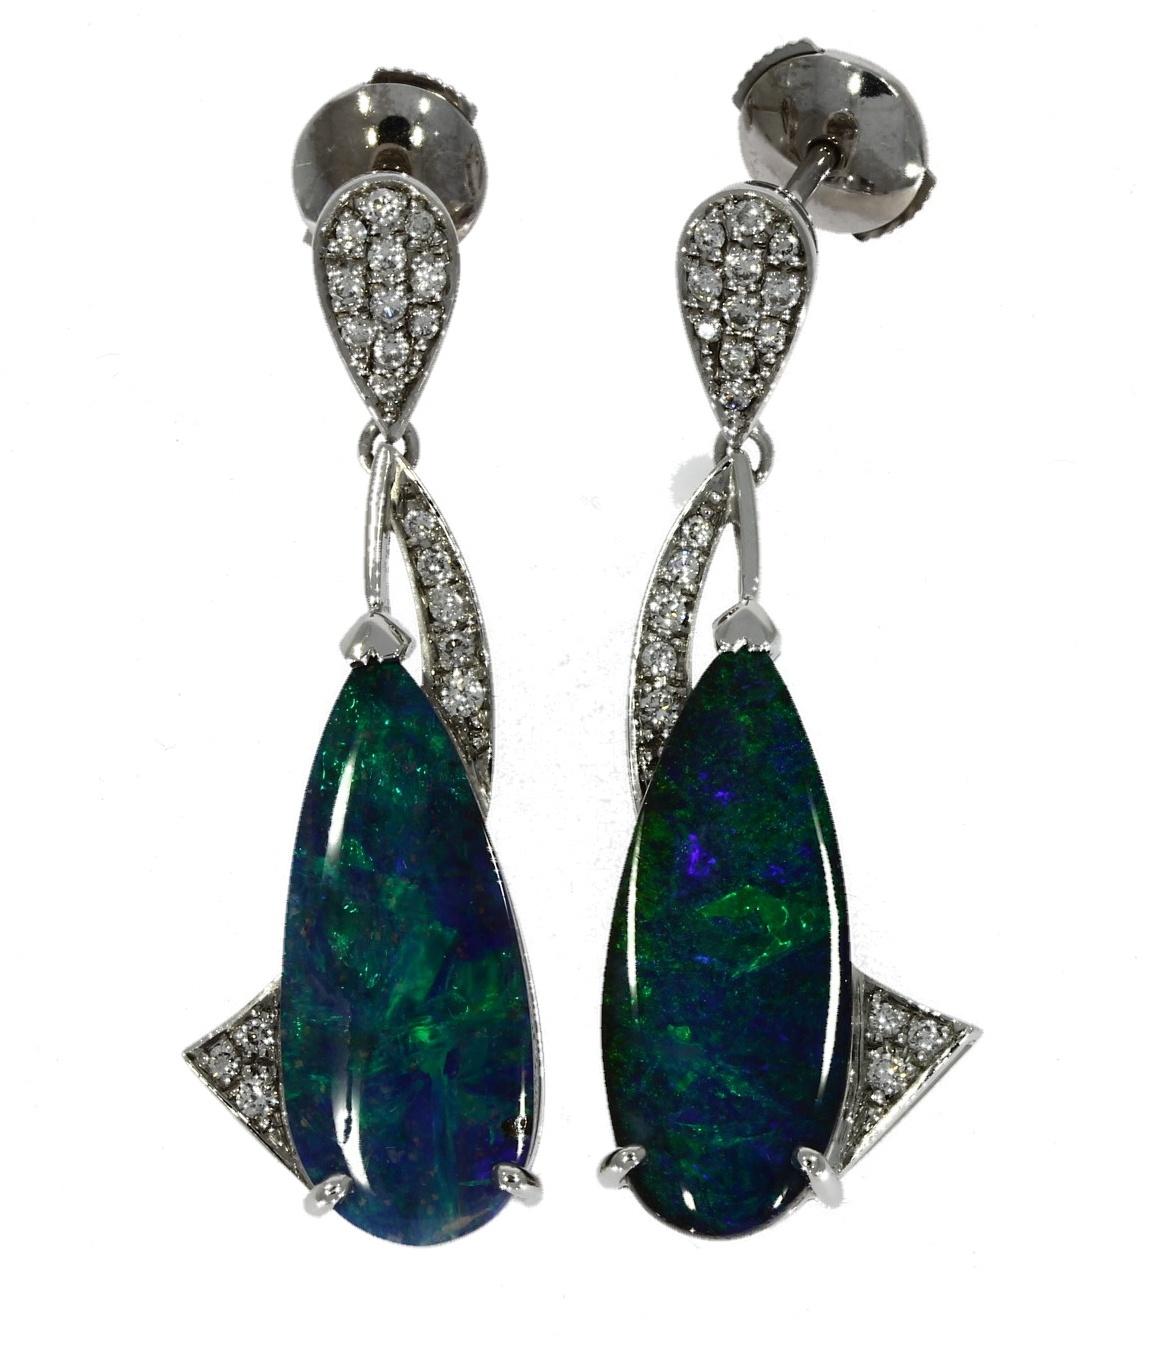 18ct white gold, opal & diamond earrings